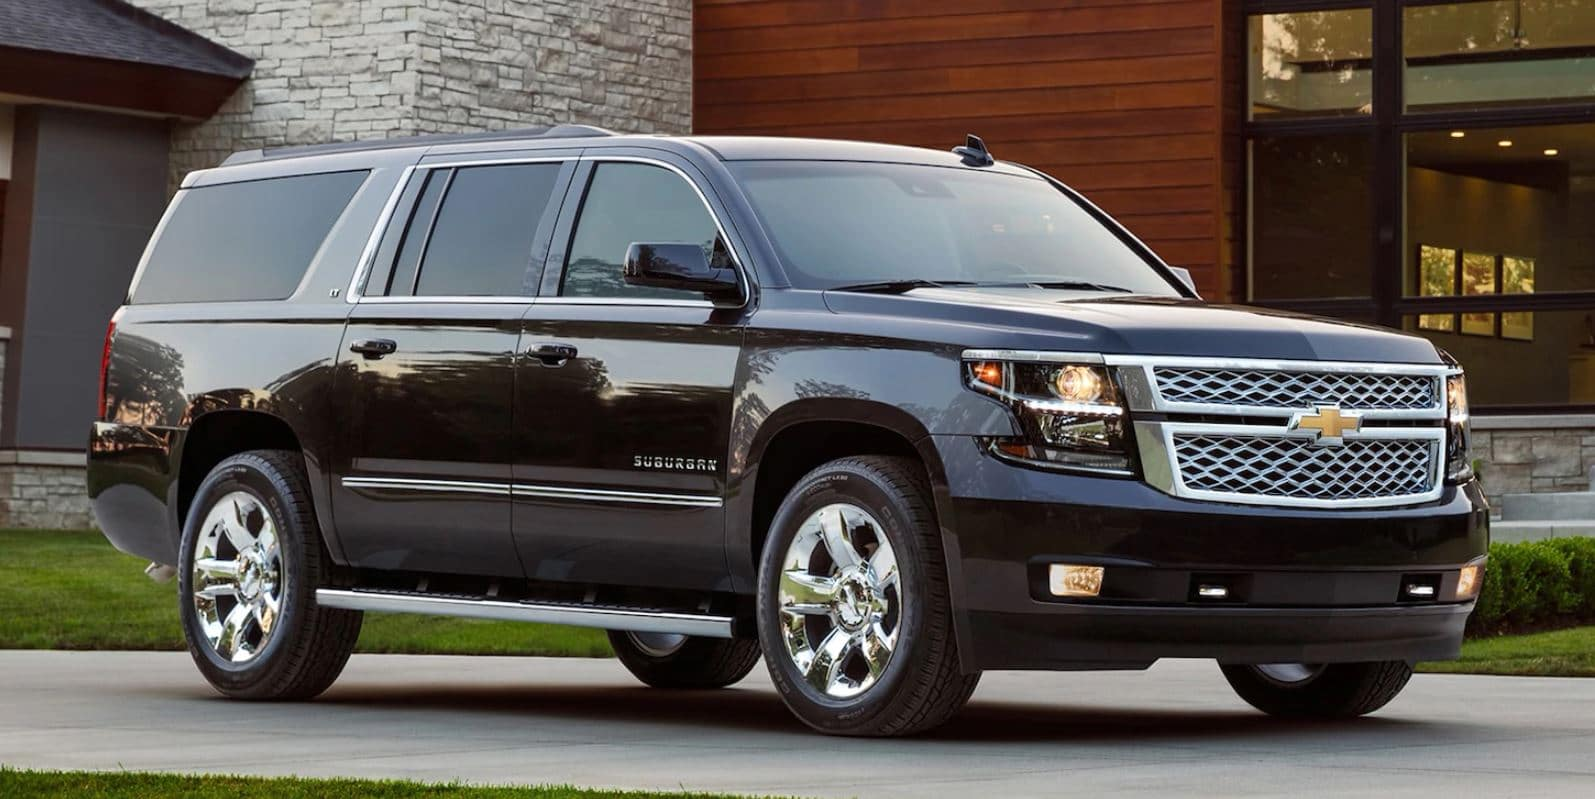 2019 Chevrolet Suburban Ron Westphal Chevrolet, Elburn ,IL